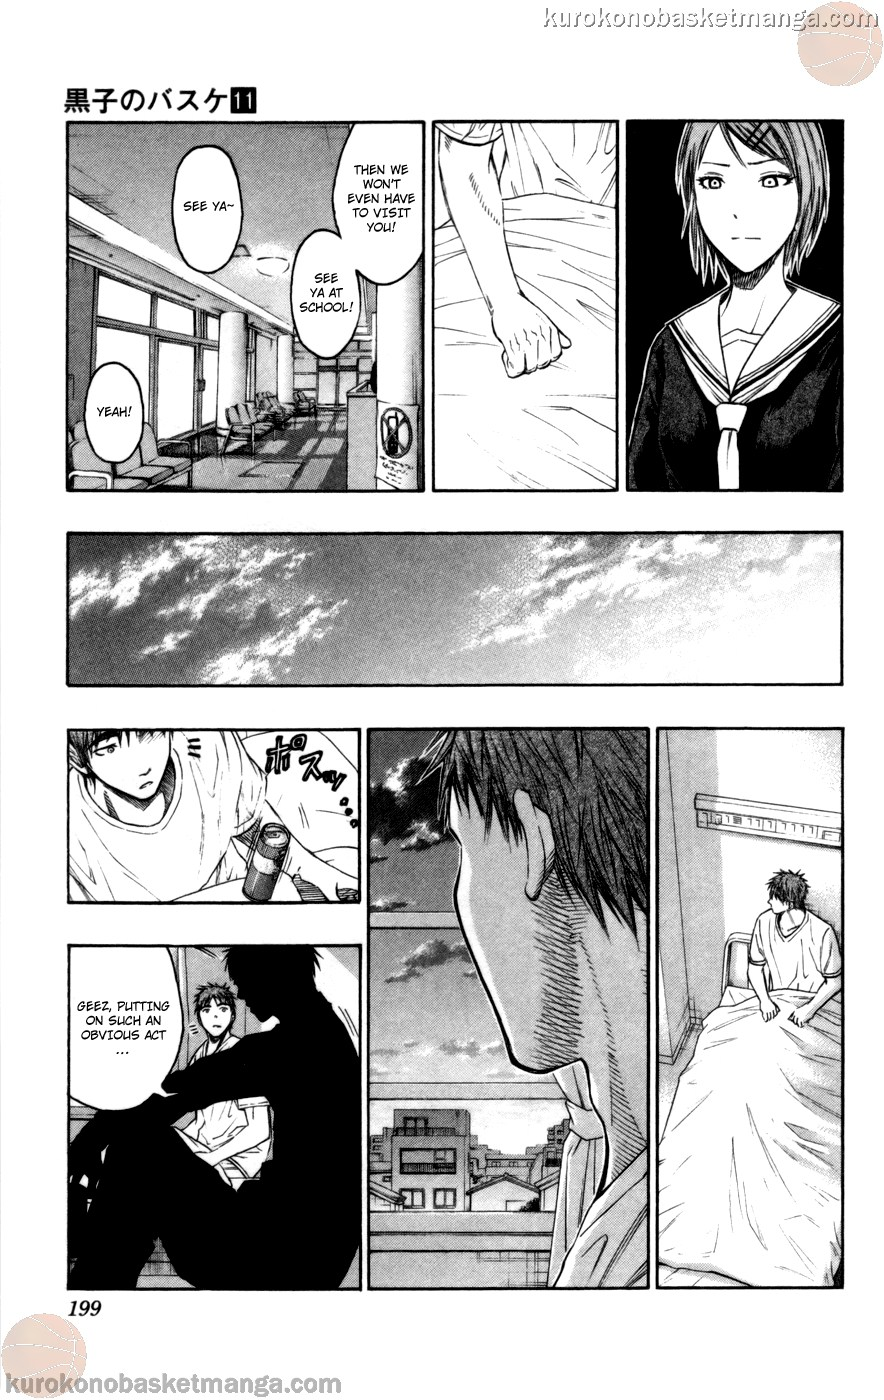 Kuroko no Basket Manga Chapter 99 - Image 14